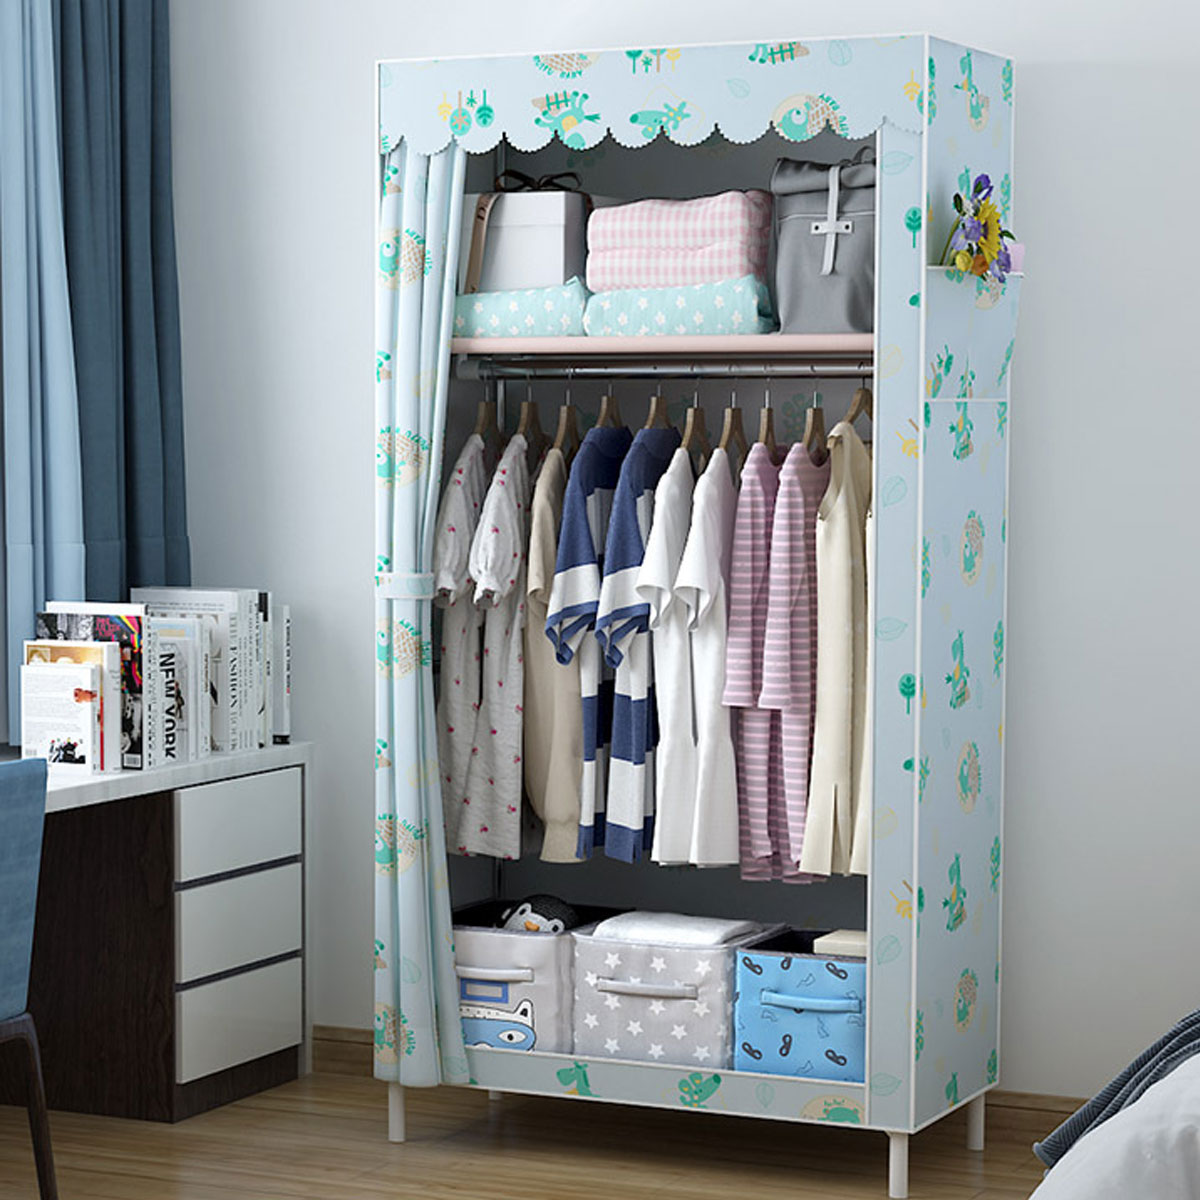 White 3-Feet Rubbermaid 3E0000WHT Linen Closet Shelf Kit